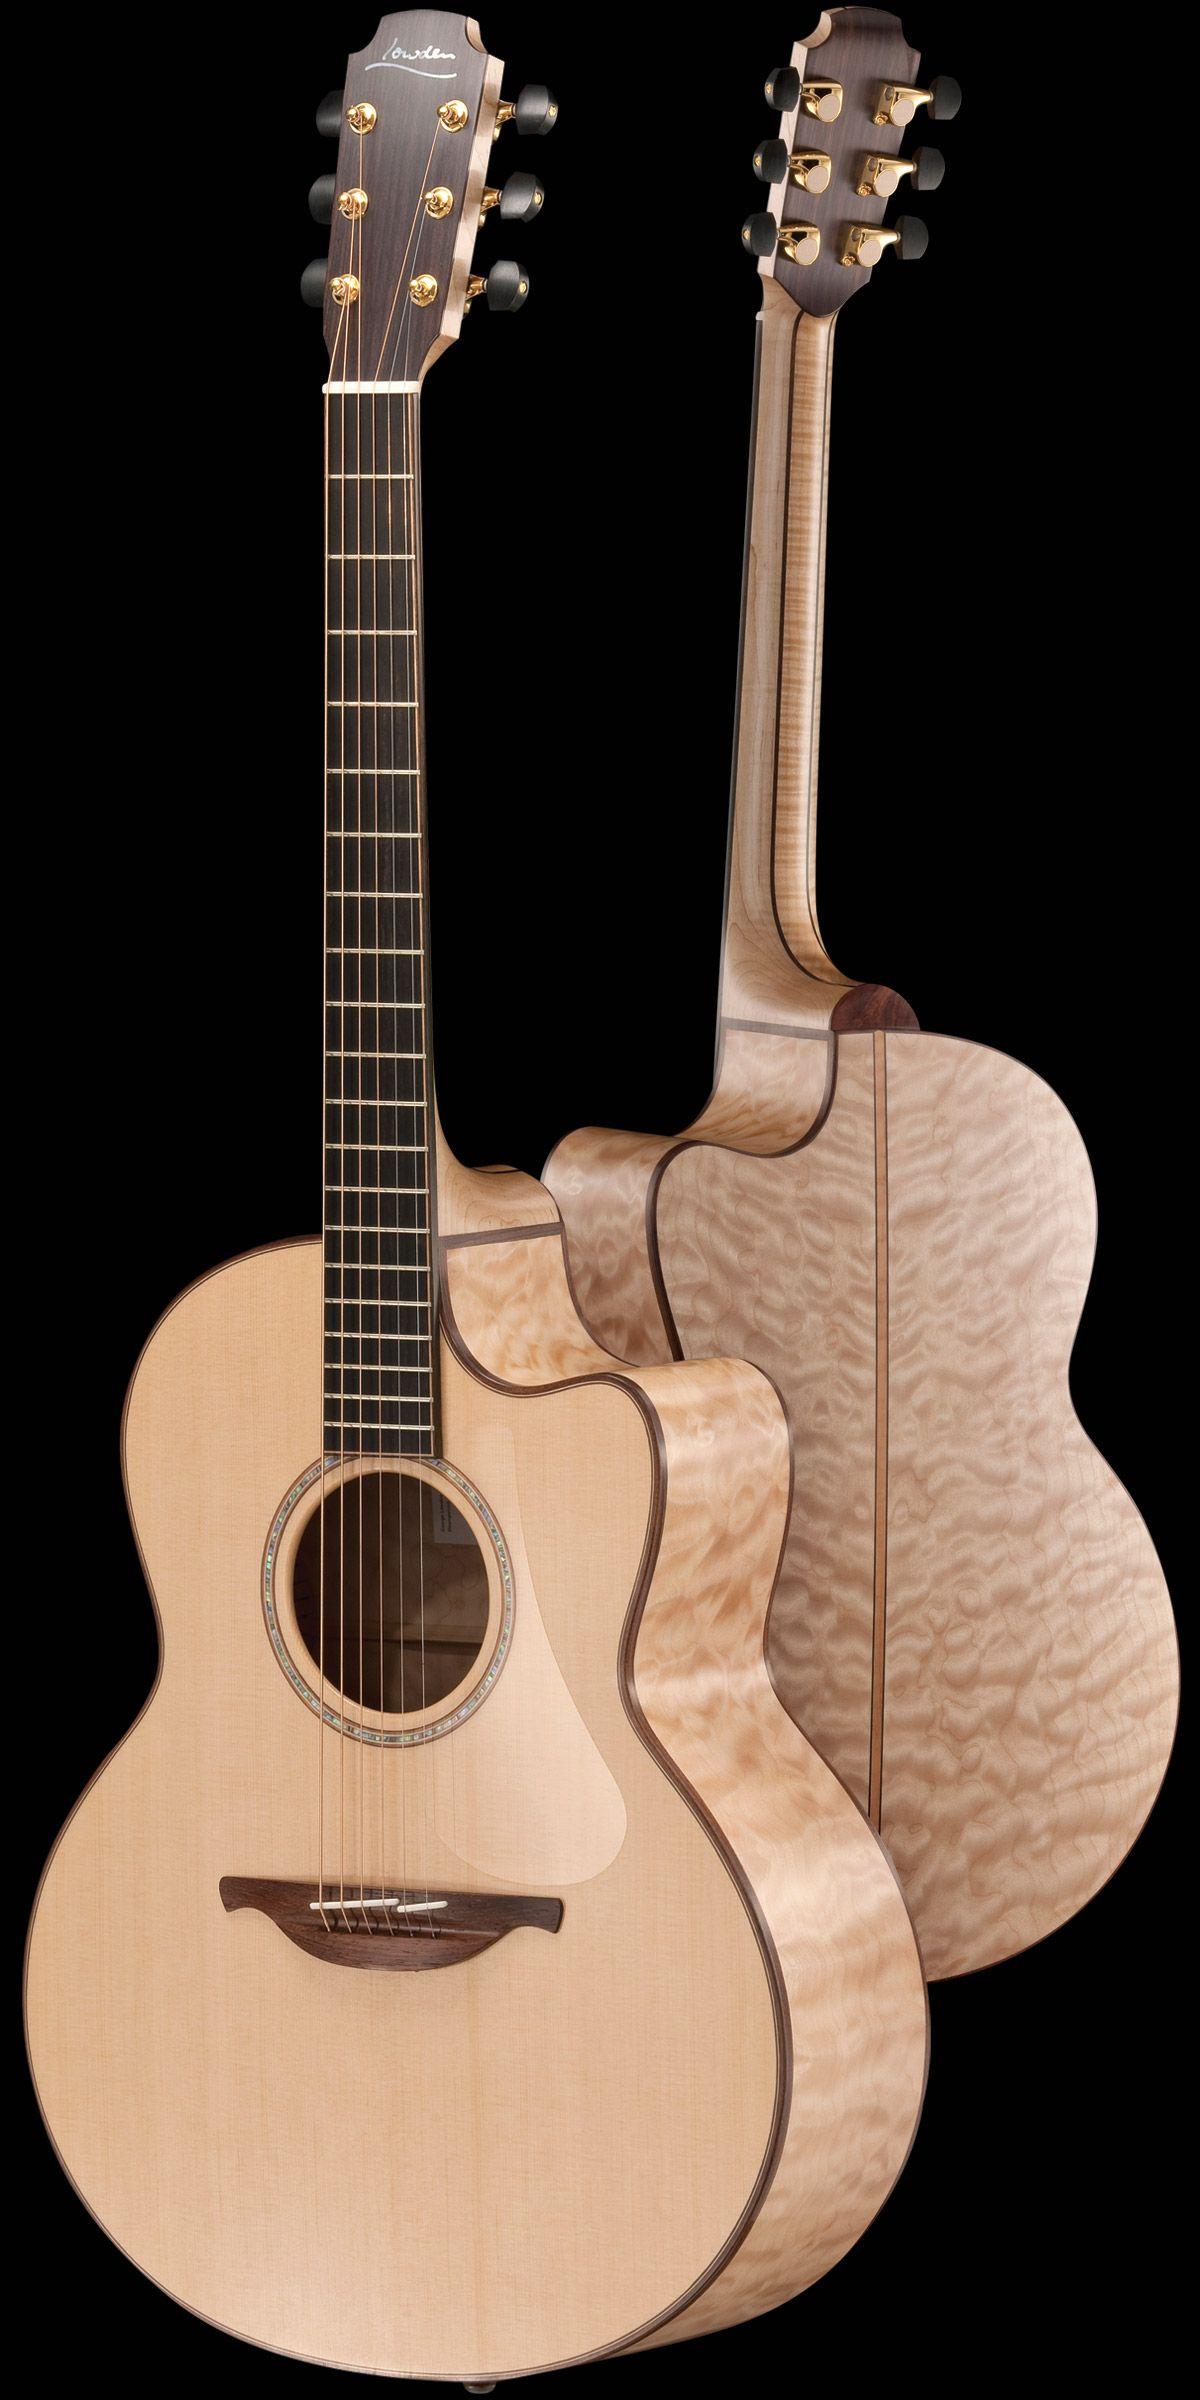 Alex De Grassi Guitar Beautiful Guitars Acoustic Guitar